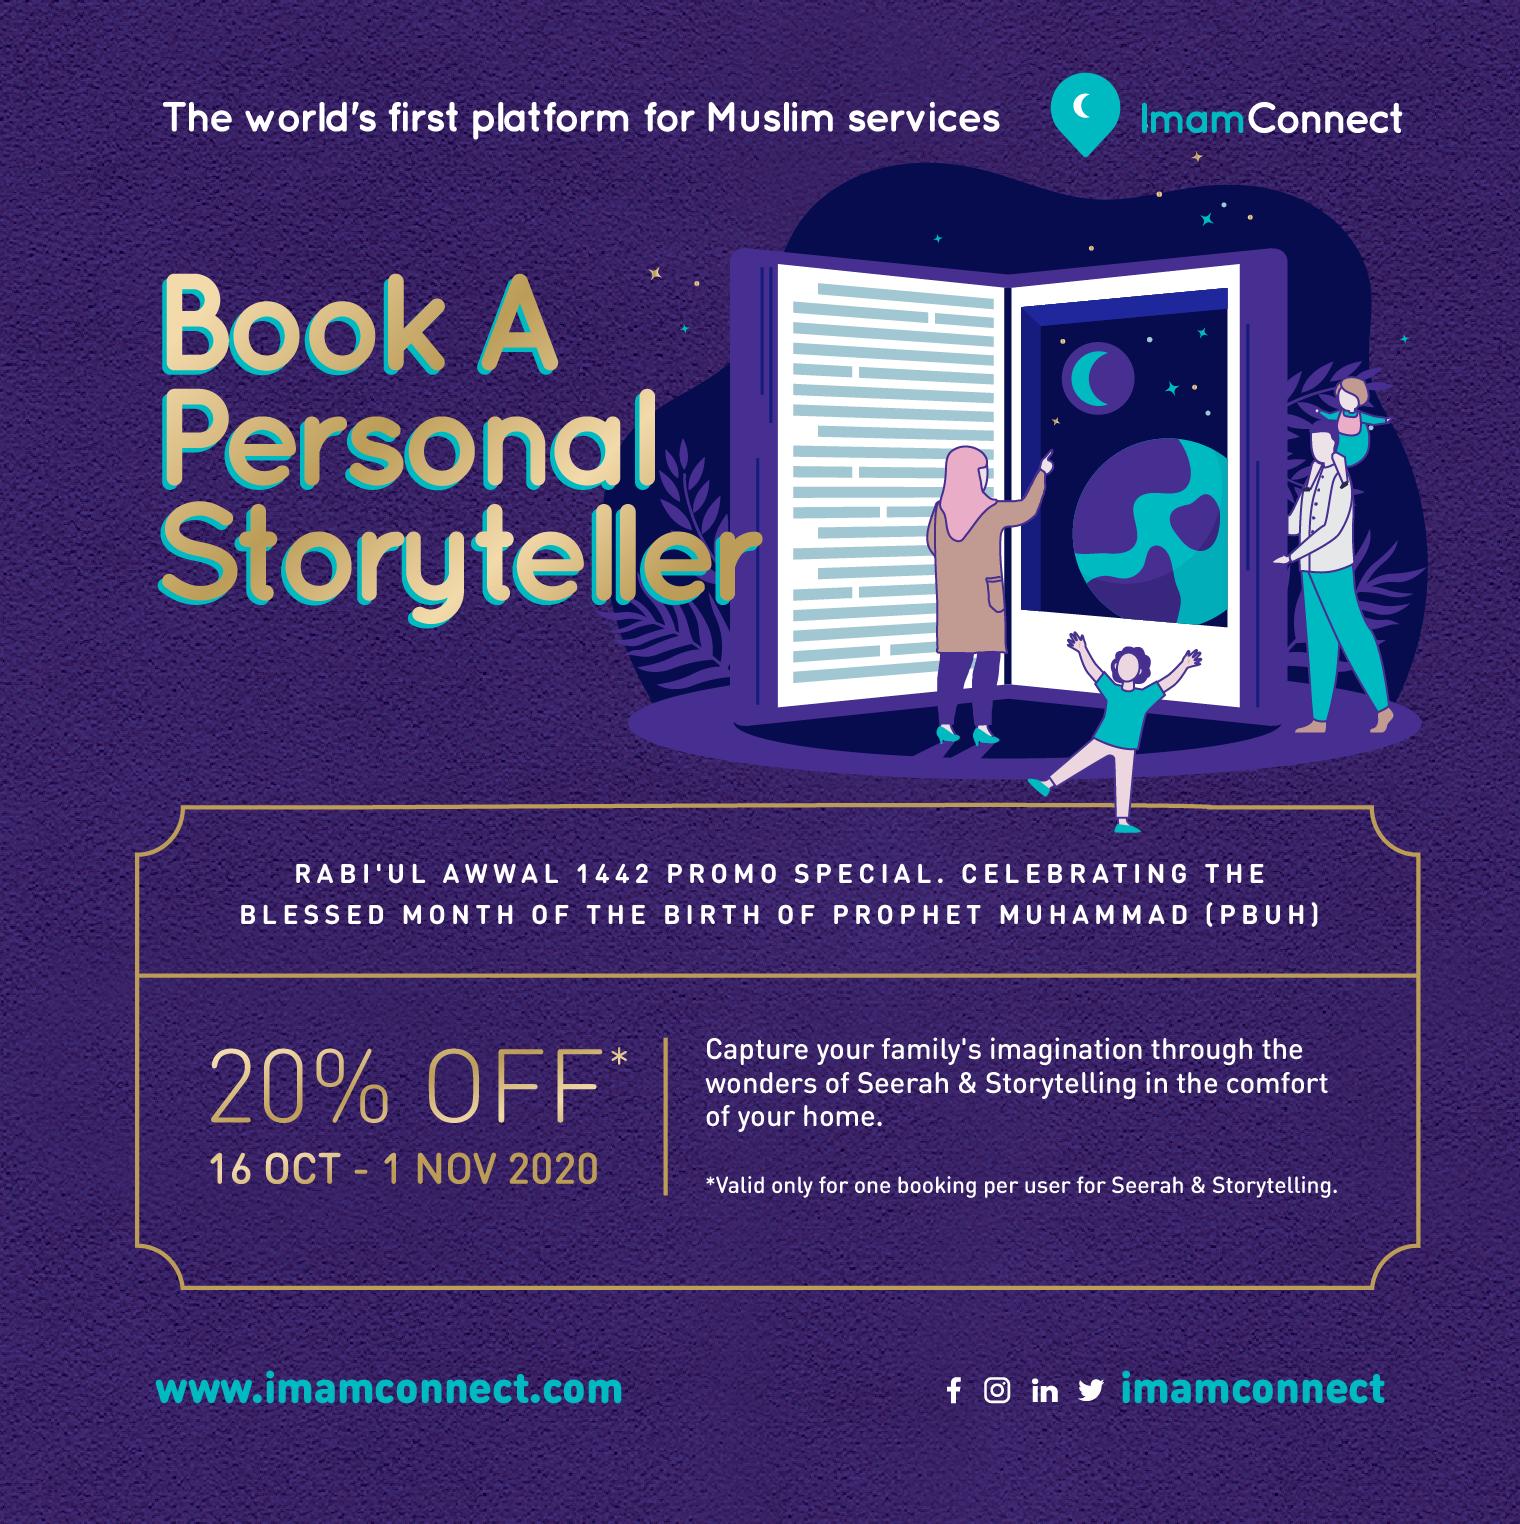 Book A Personal Storyteller Promo